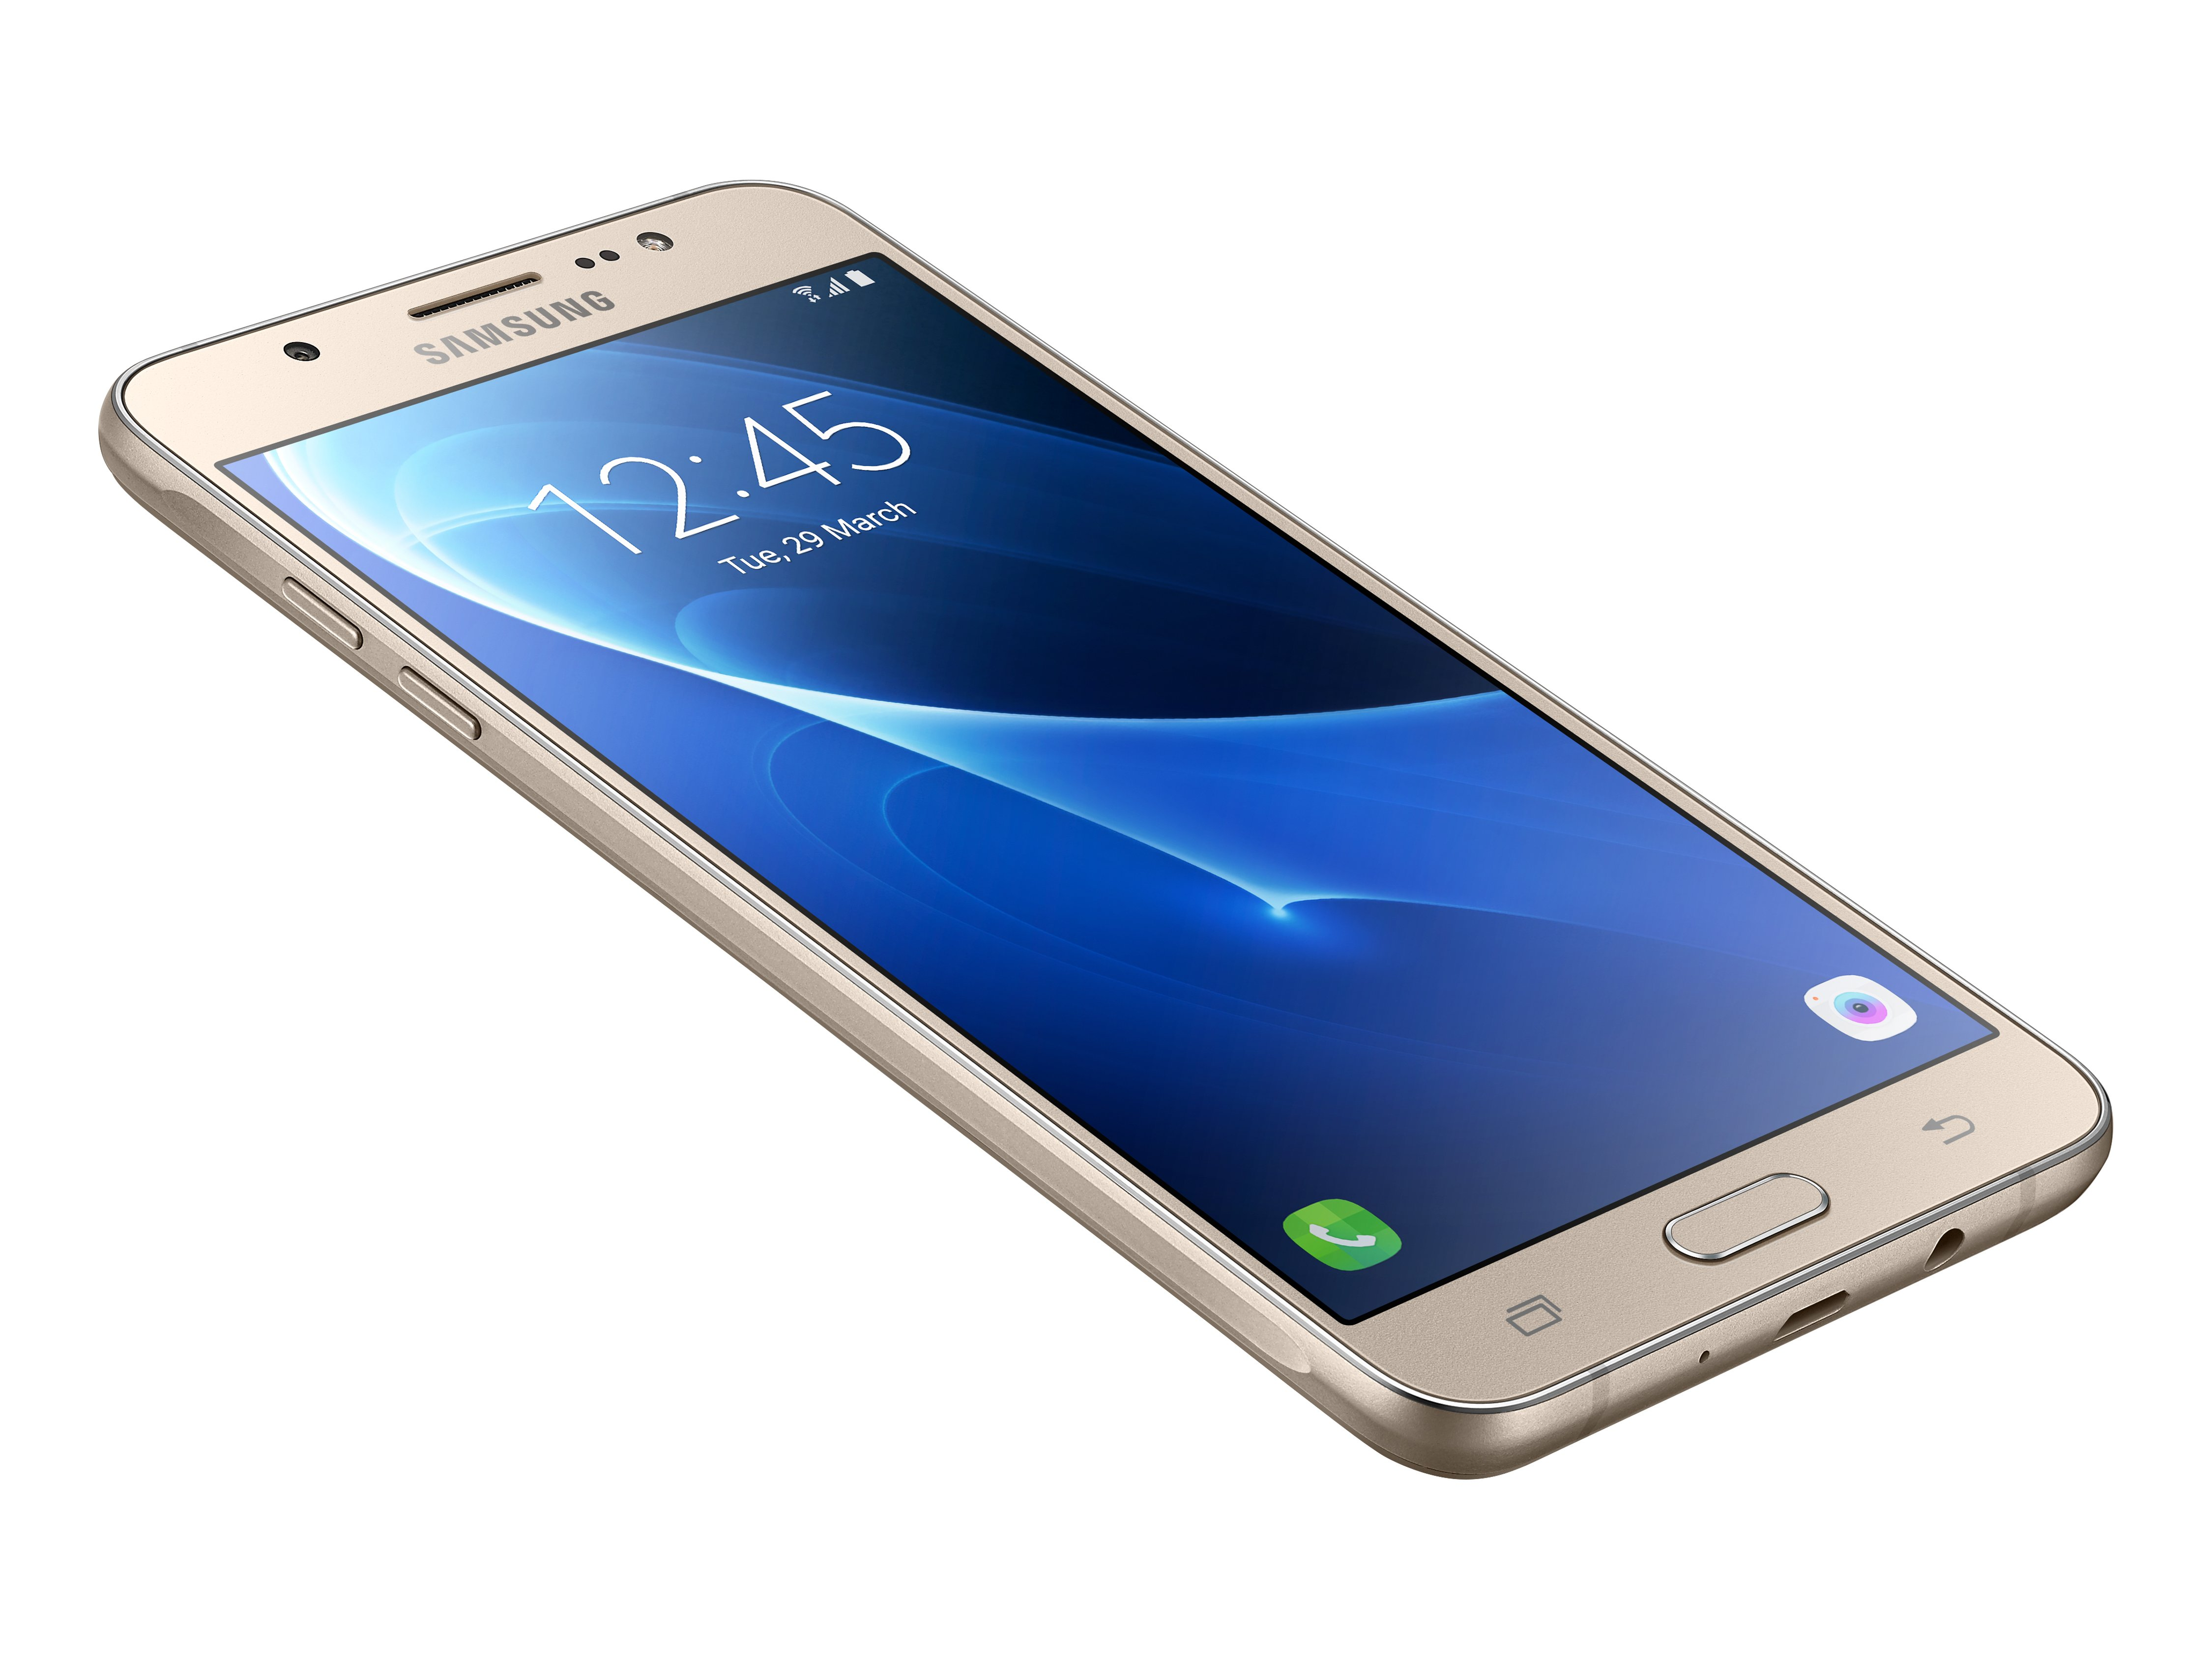 Samsung Galaxy J7 (2016) Smartphone Review